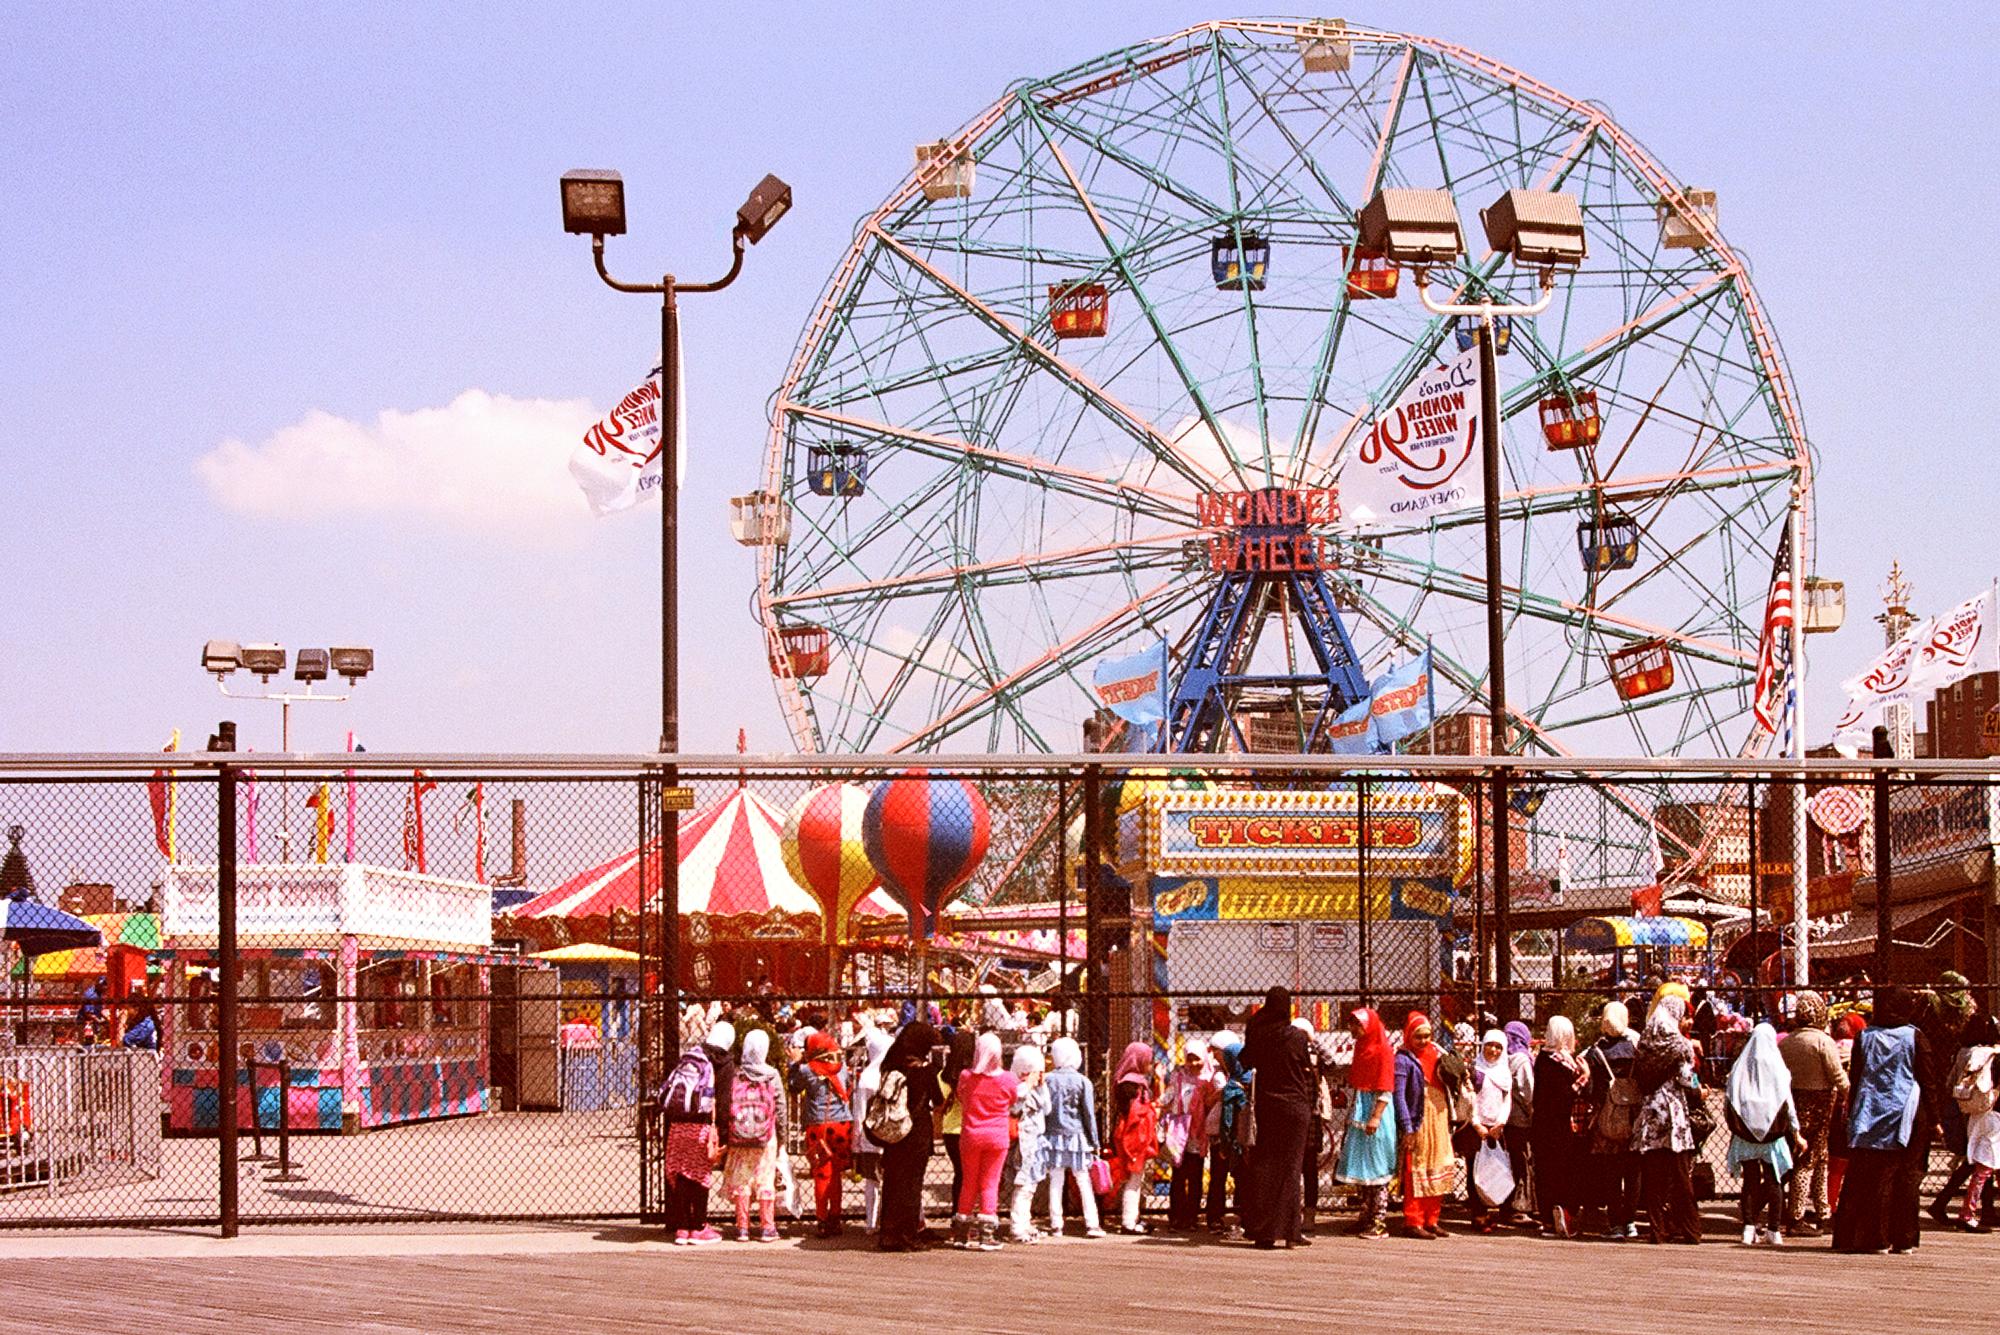 Coney Island, Summer 2016